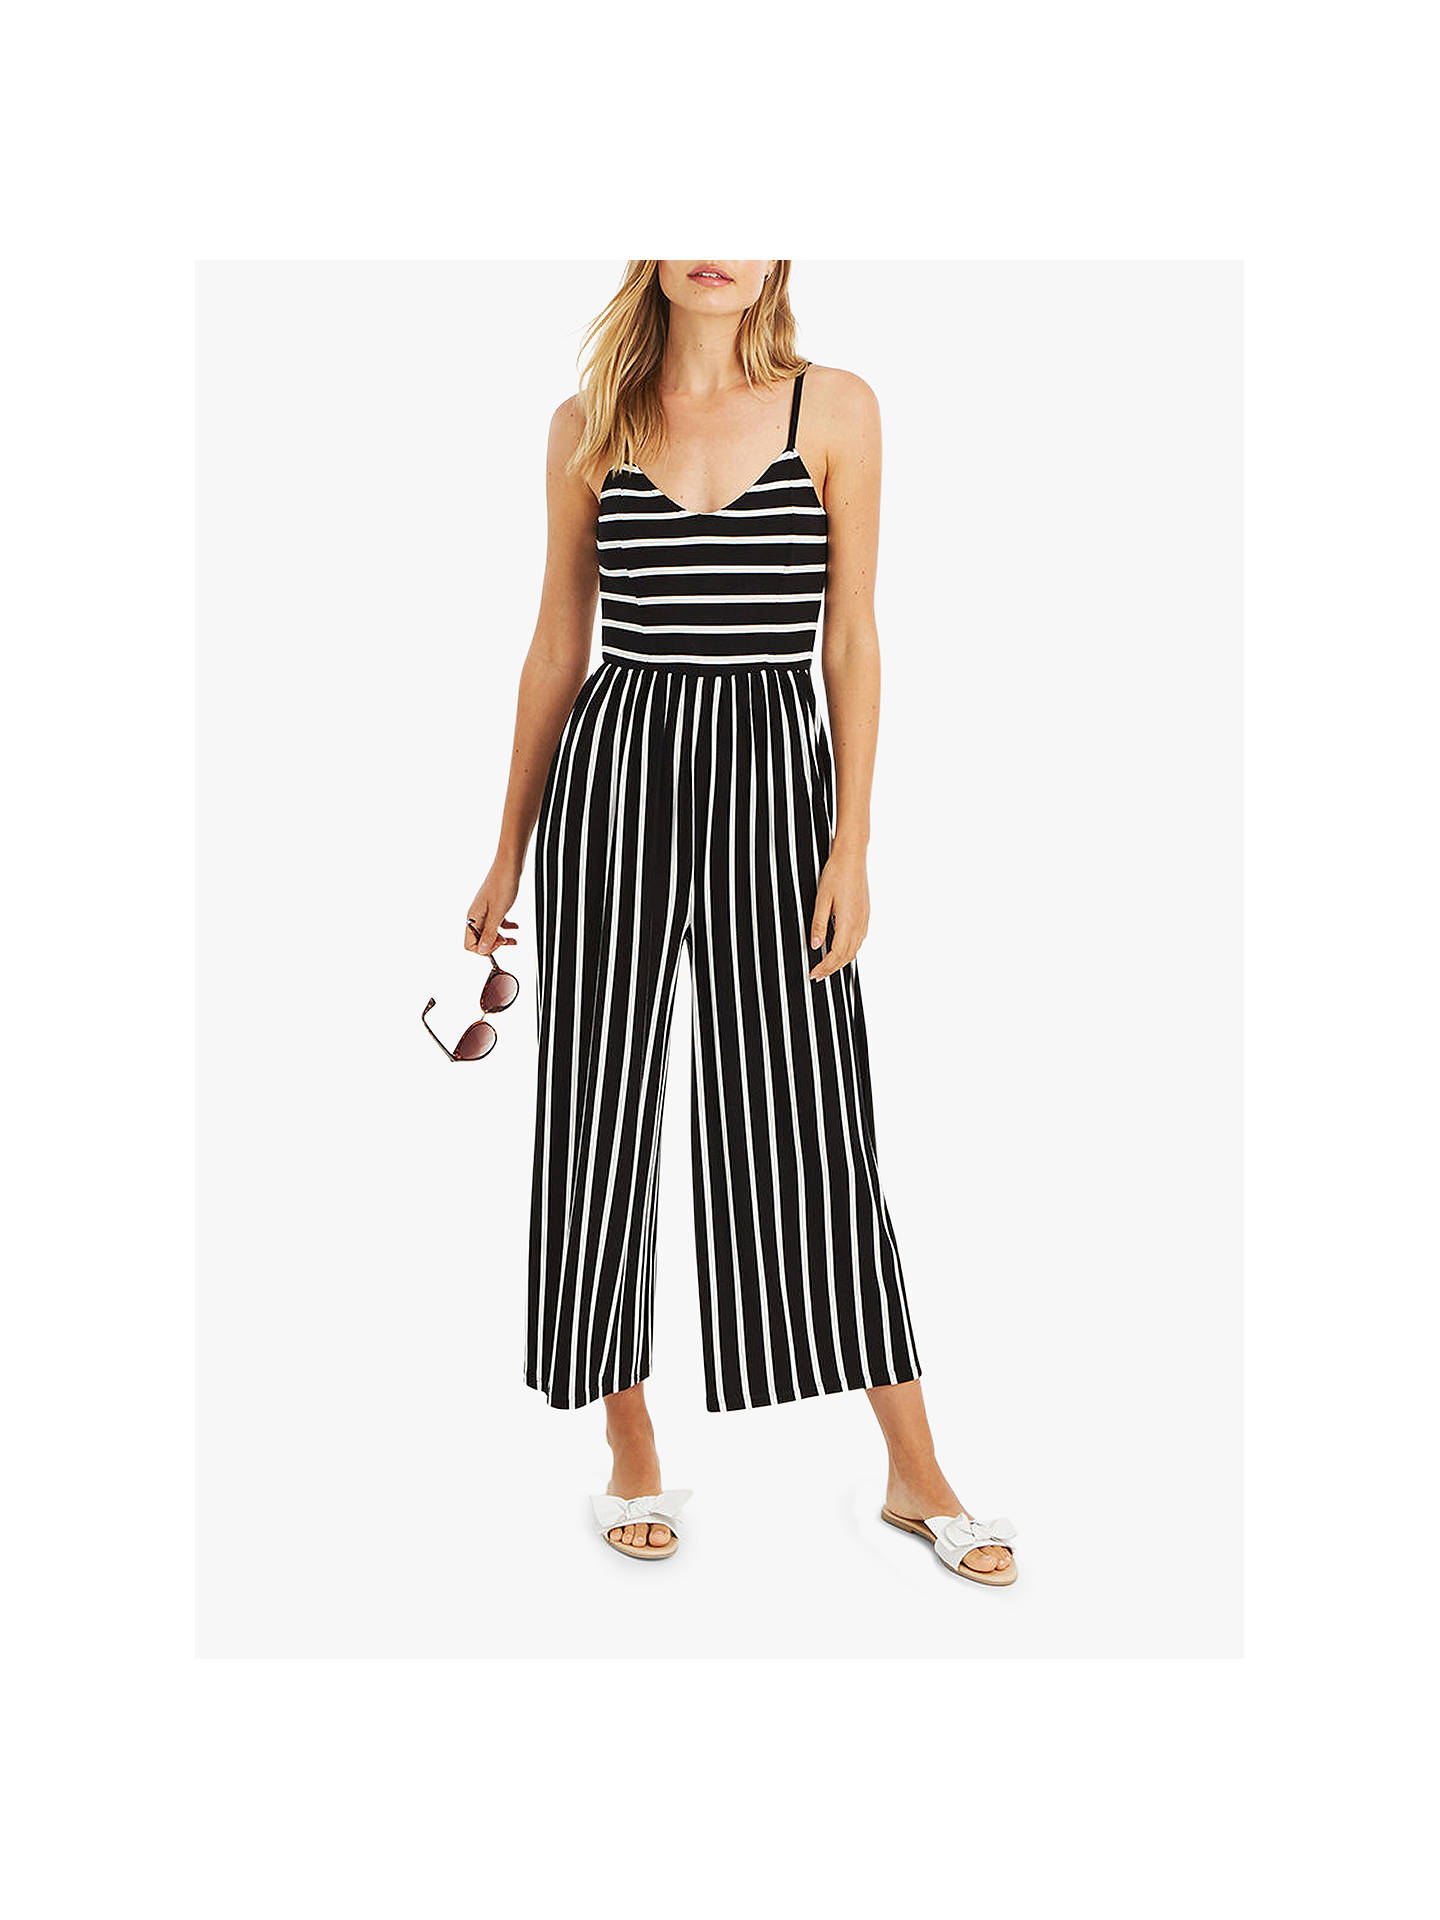 548b5bc1119 Buy Oasis Culotte Stripe Jumpsuit